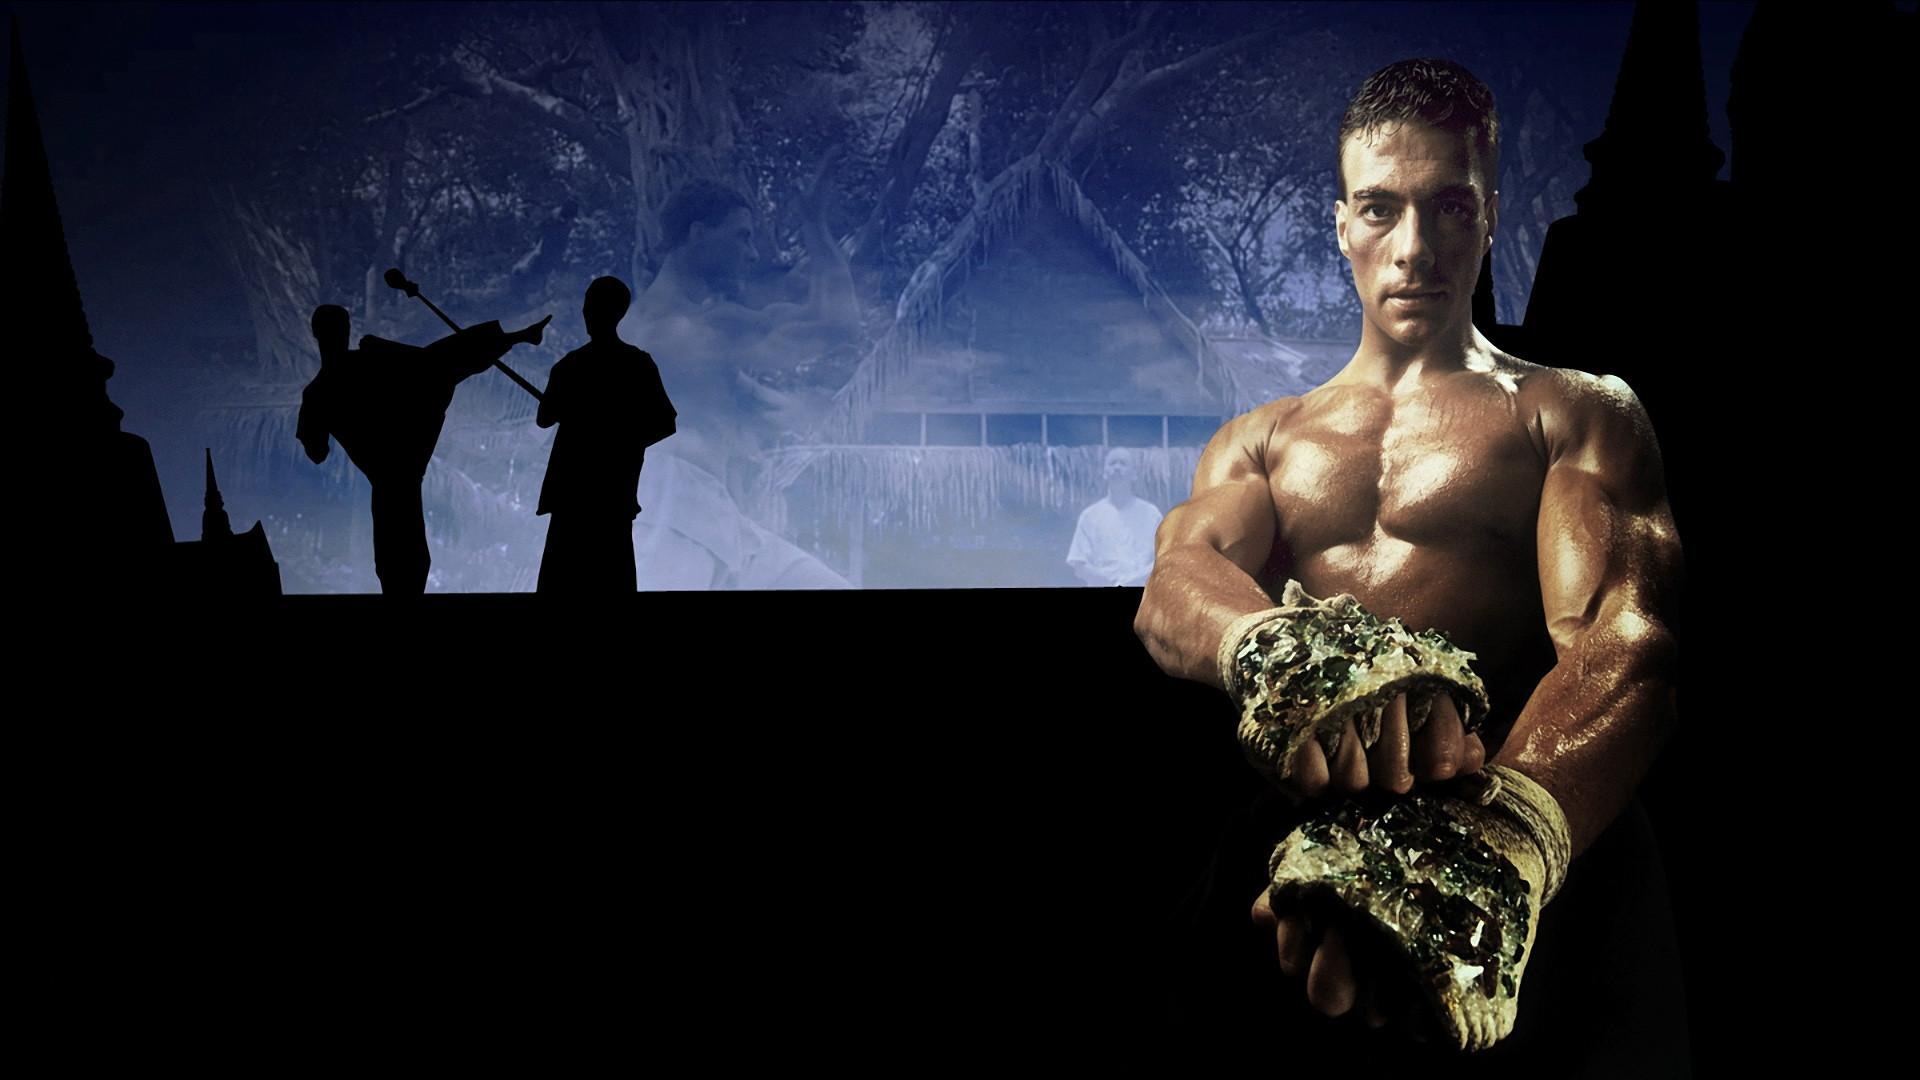 [50+] Kickboxer Wallpaper on WallpaperSafari